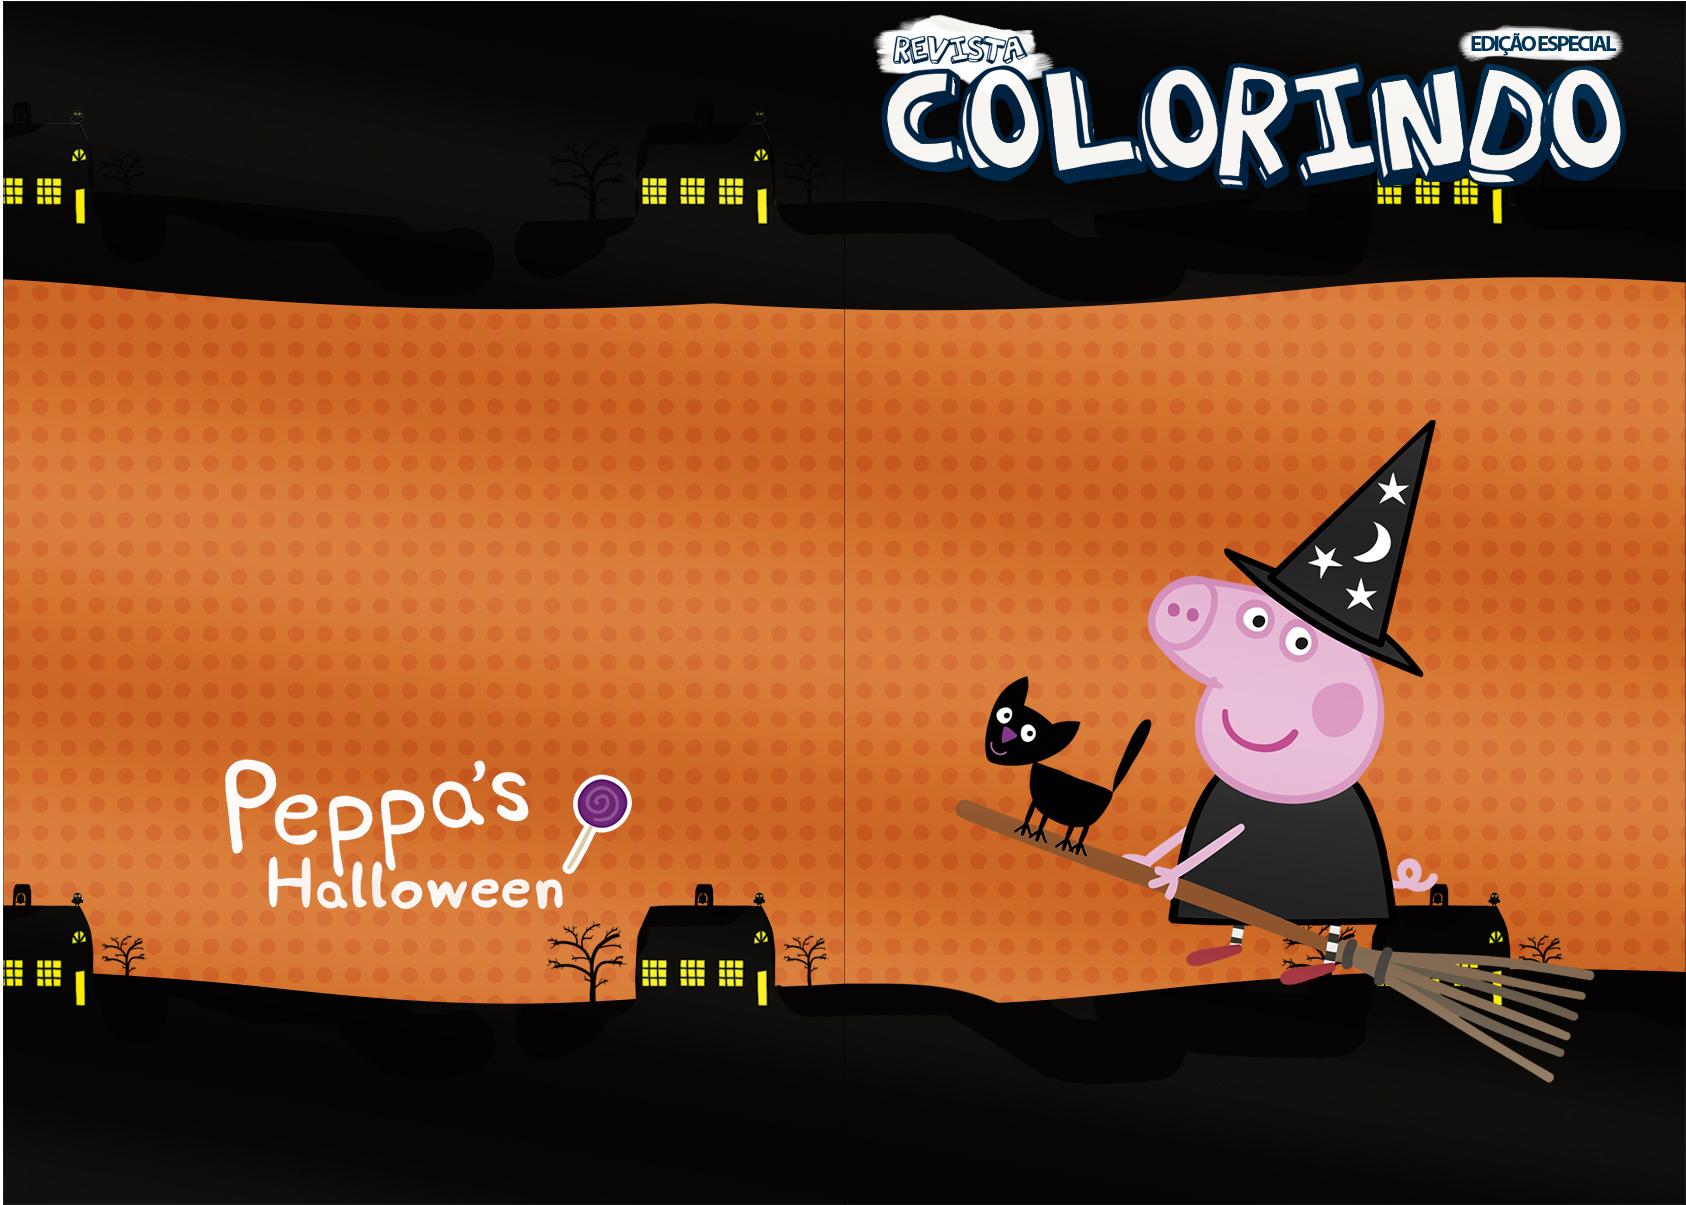 Capa Revista Colorindo Peppa Pig Halloween